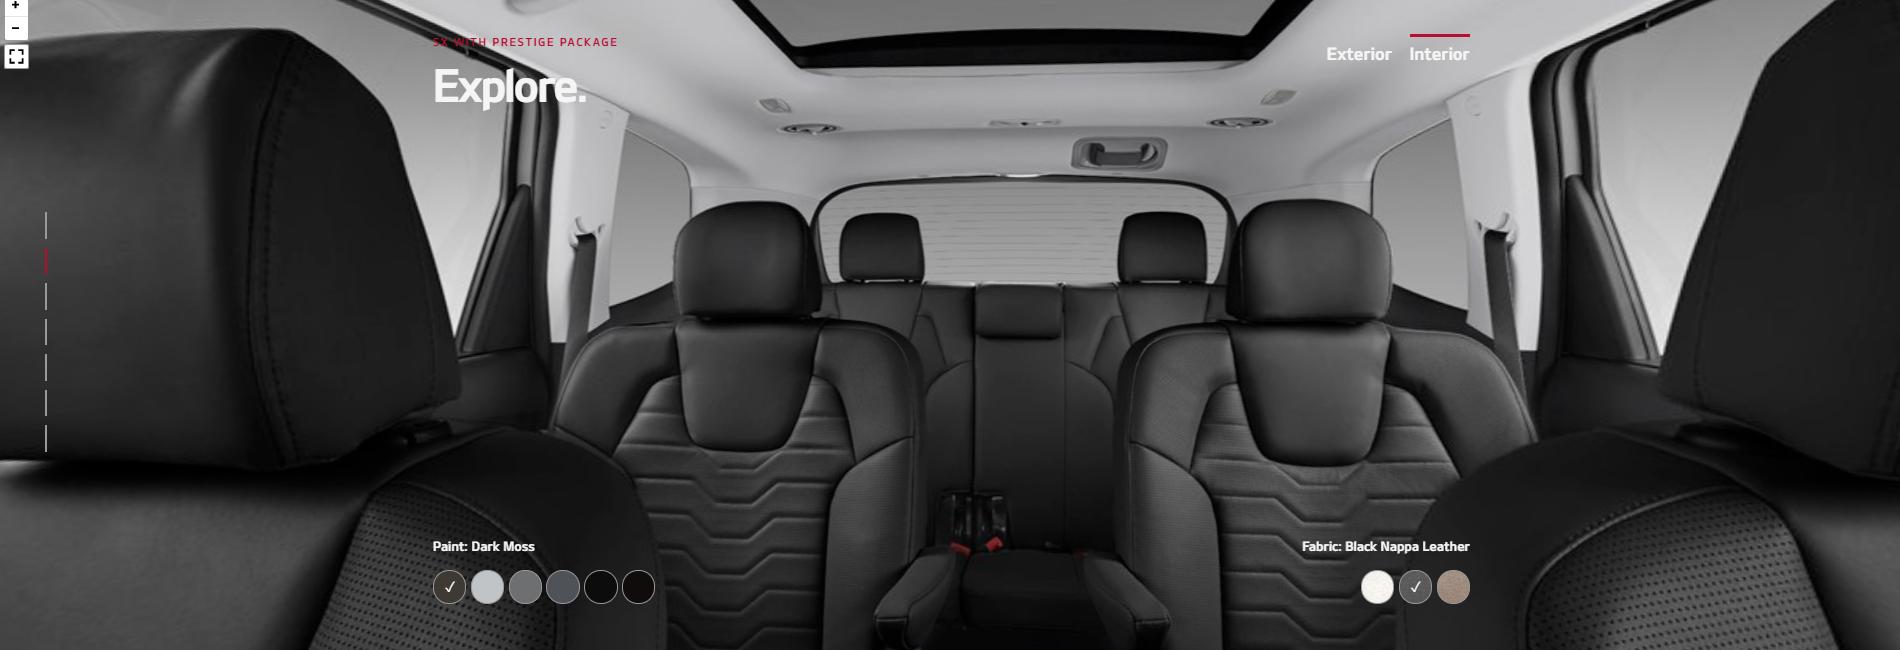 2020 Kia Telluride Black Nappa Leather